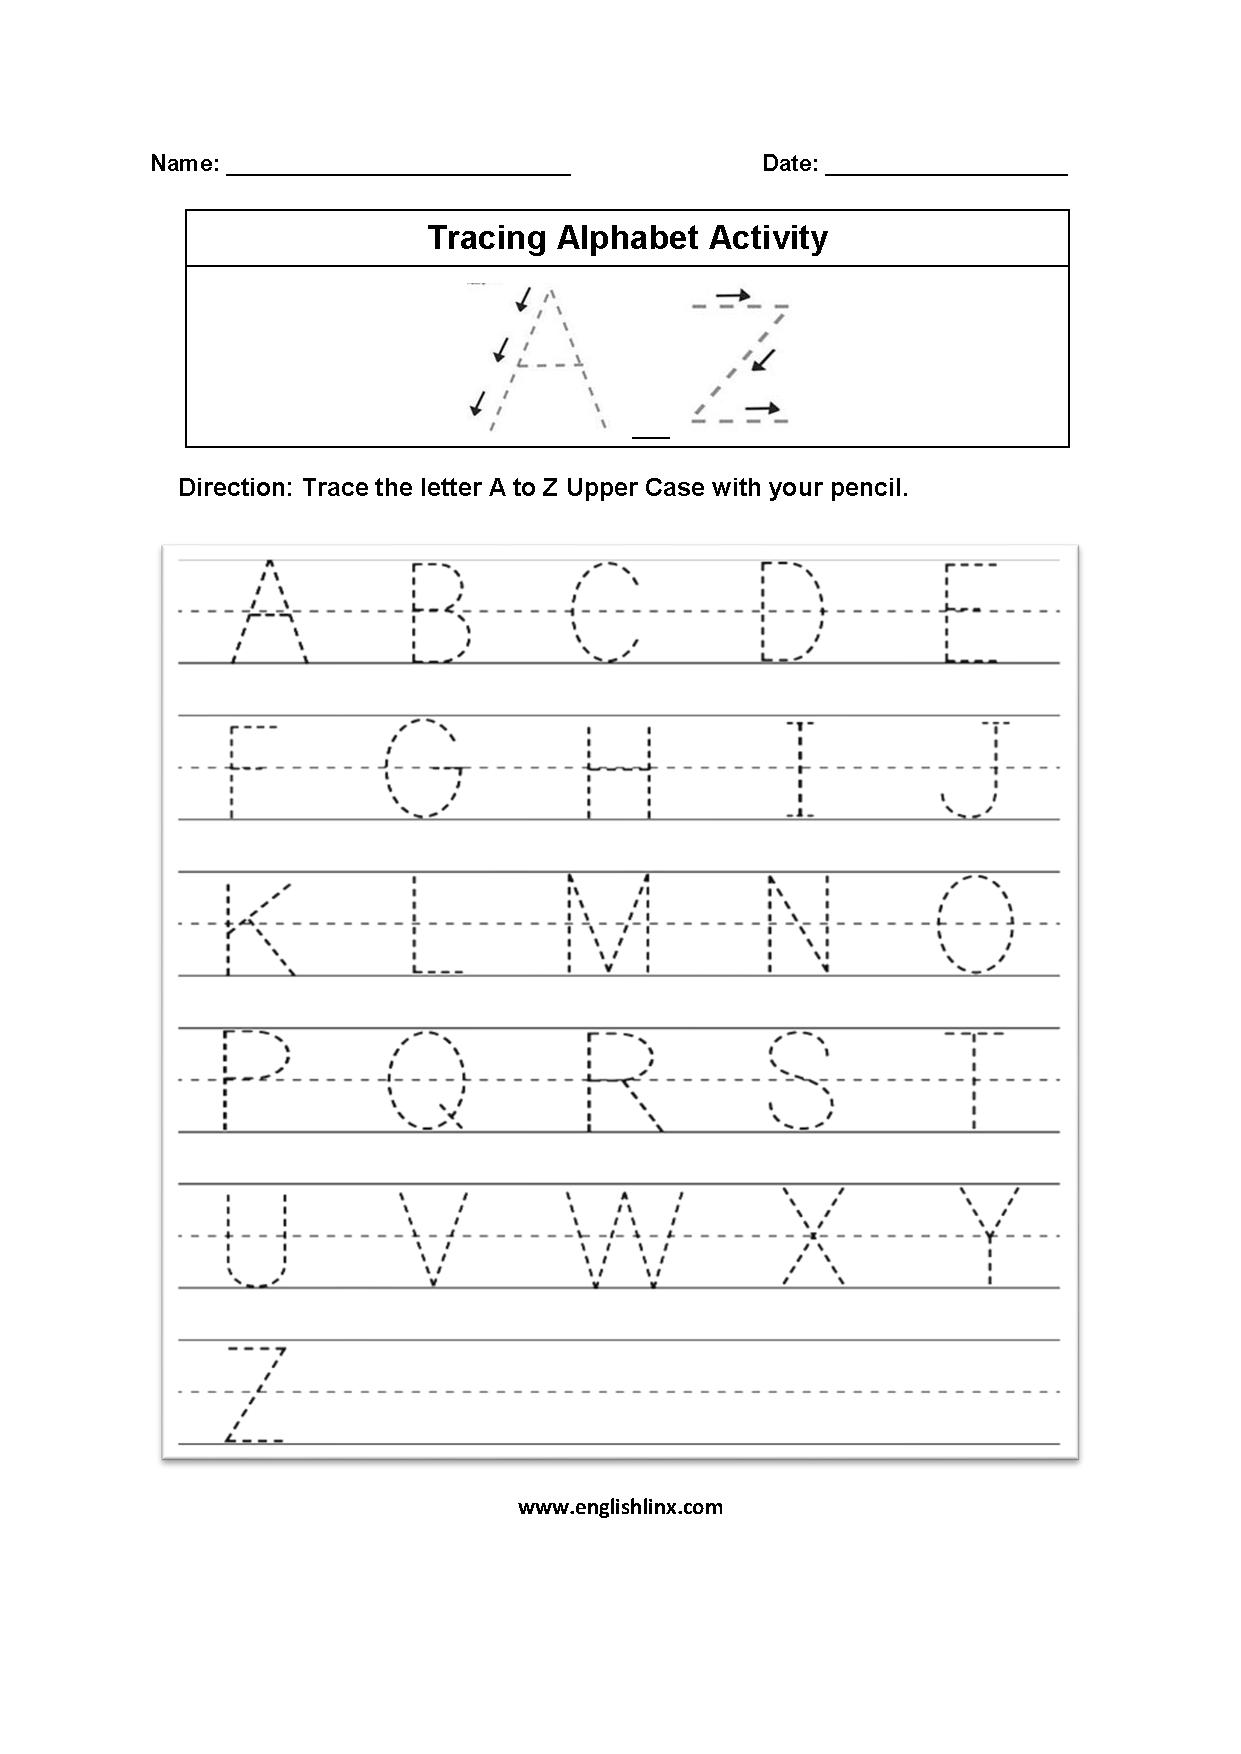 A To Z Alphabet Worksheets Pdf لم يسبق له مثيل الصور + Tier3.xyz with Alphabet Worksheets A-Z Pdf